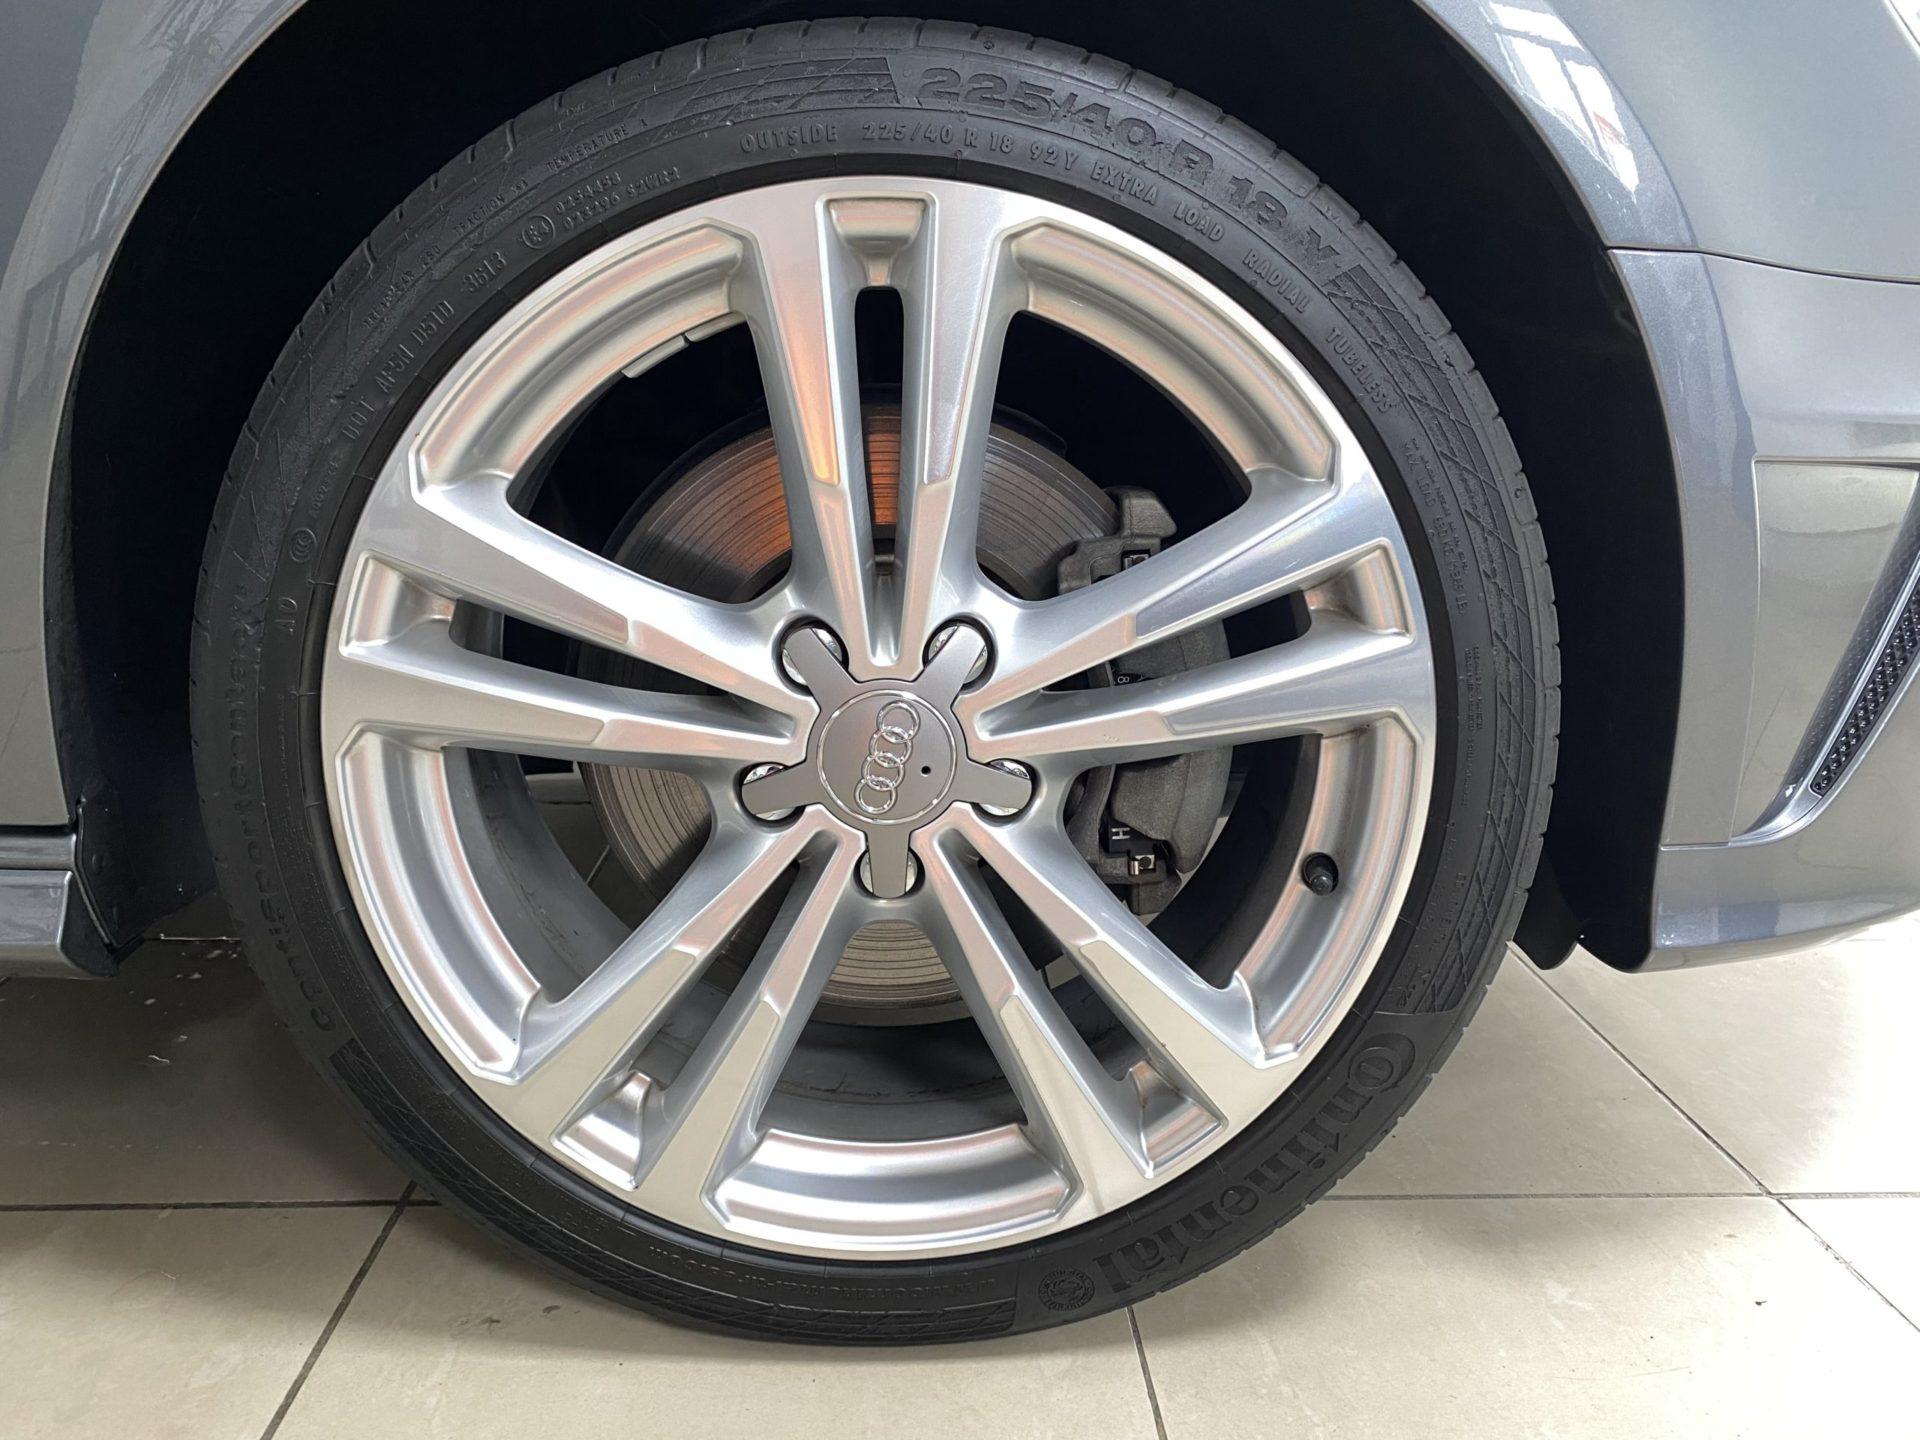 Audi A3 Sportback 1.4 TFSI e-tron 204 Ambition Luxe S-Line Plus S tronic 6 - GMC AUTO 67